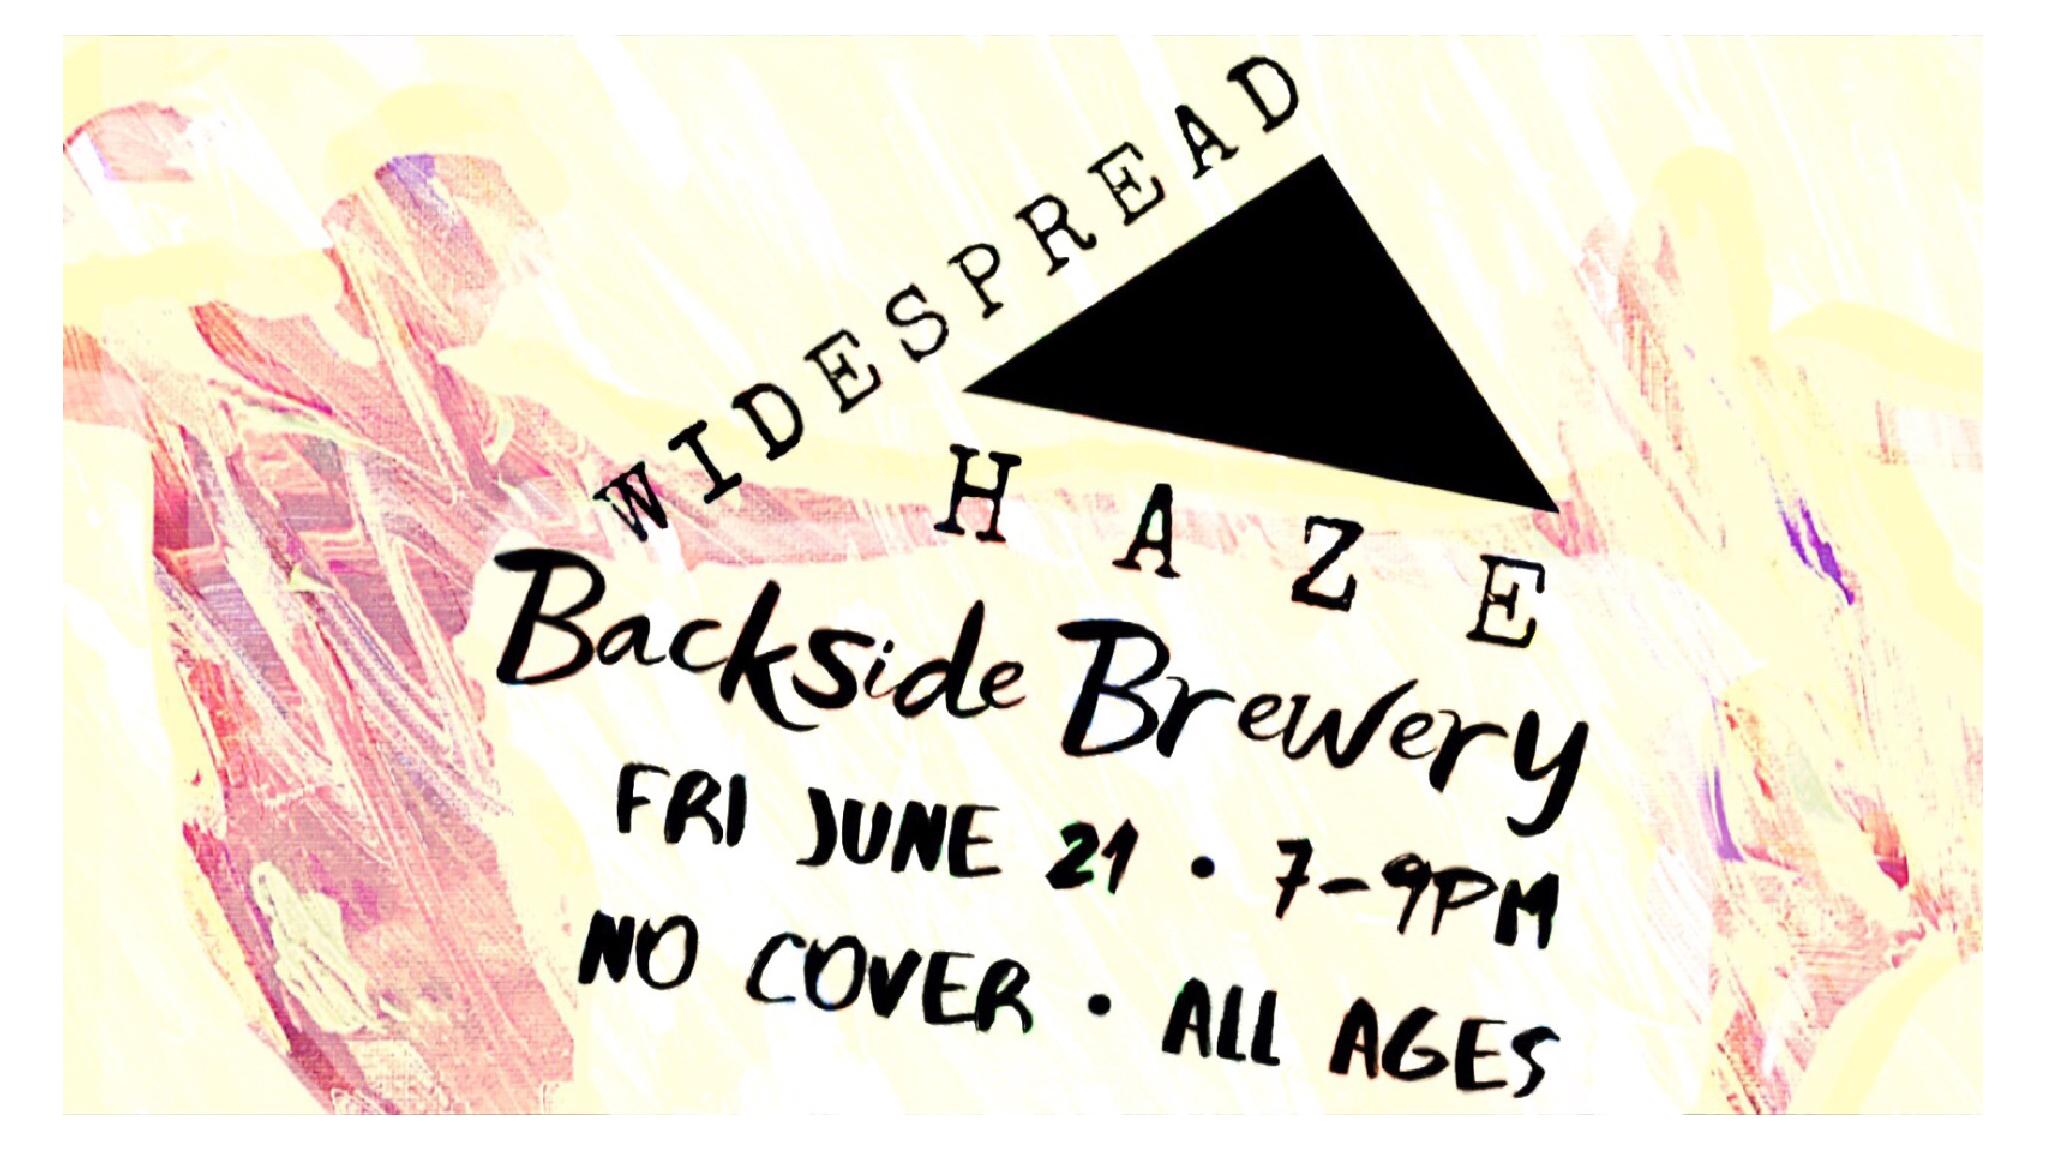 widespread-haze-backside-brewery-june-promo-100.jpg